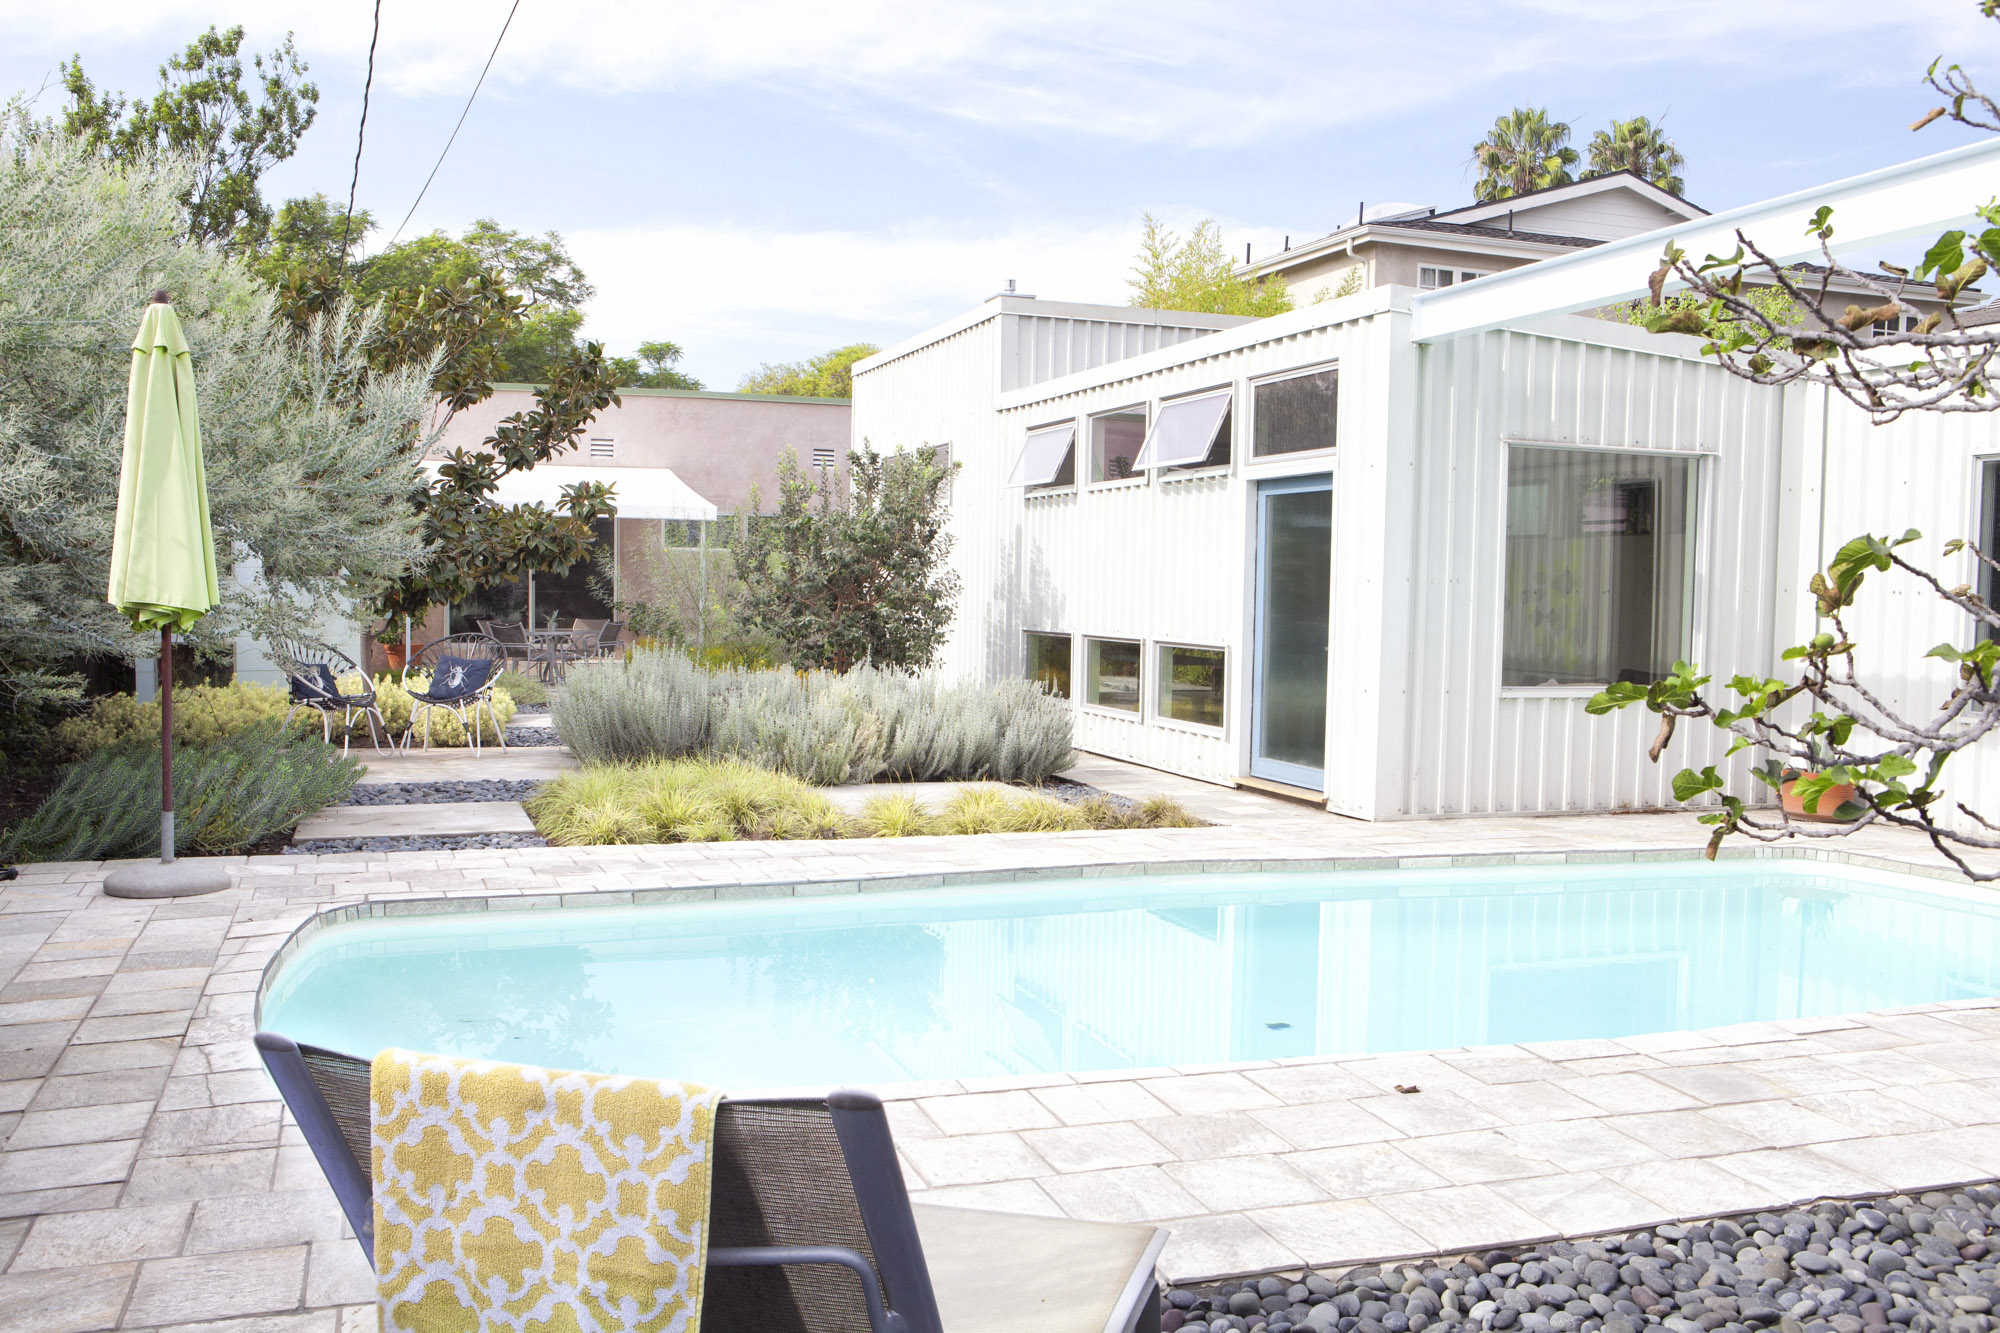 530 N. Martel Avenue, Los Angeles, CA 90036